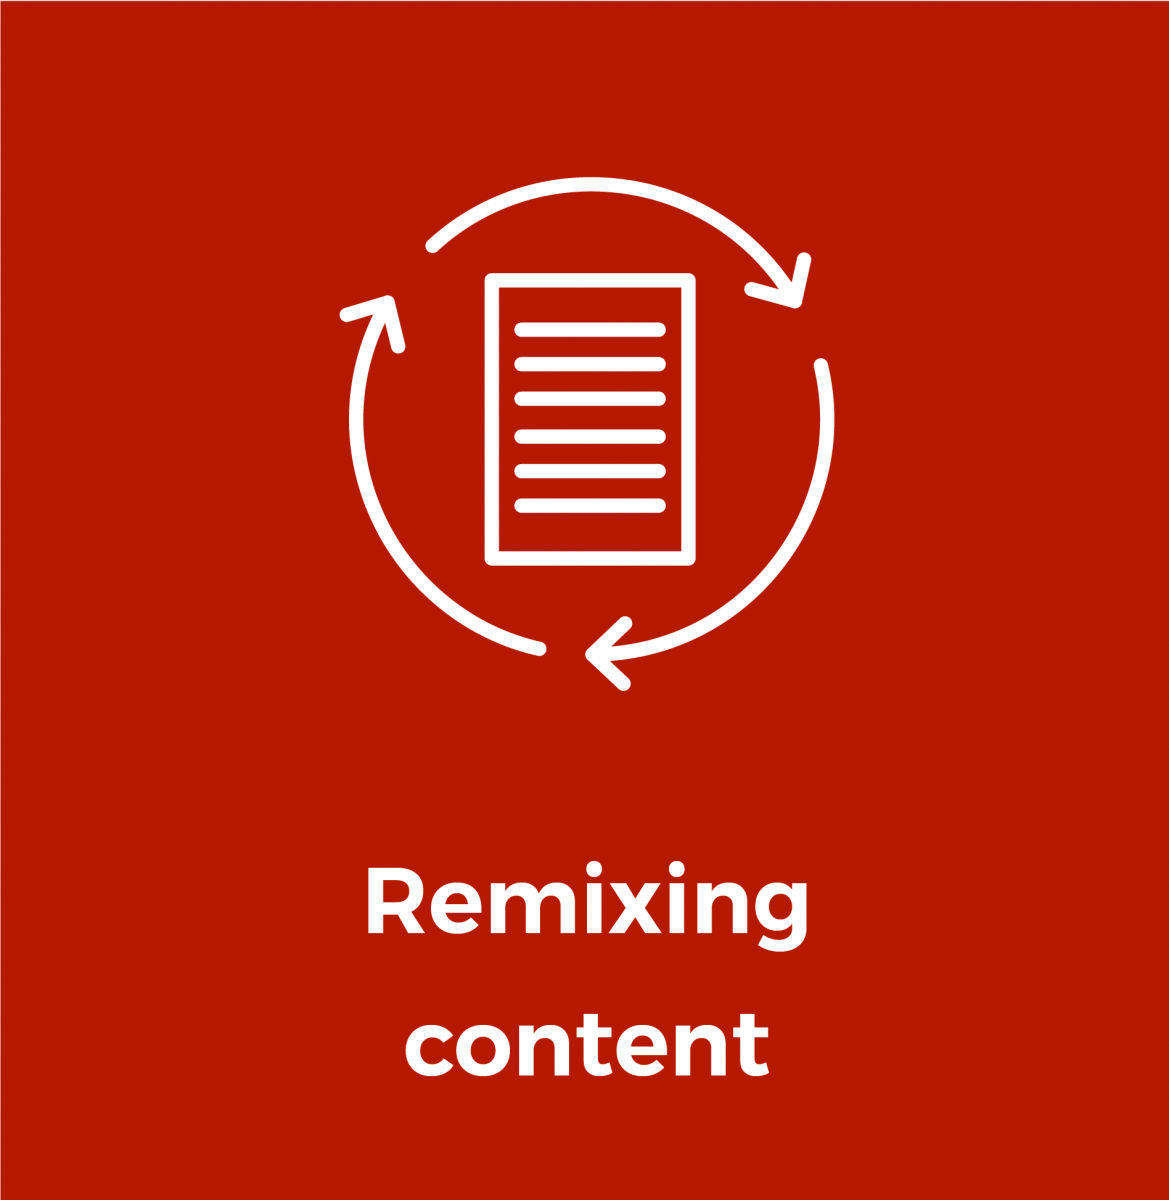 Digital Marketing Content Services | Training Data | Data Management - Reactionpower Blog-elements-03 TimelessMarketing Tips